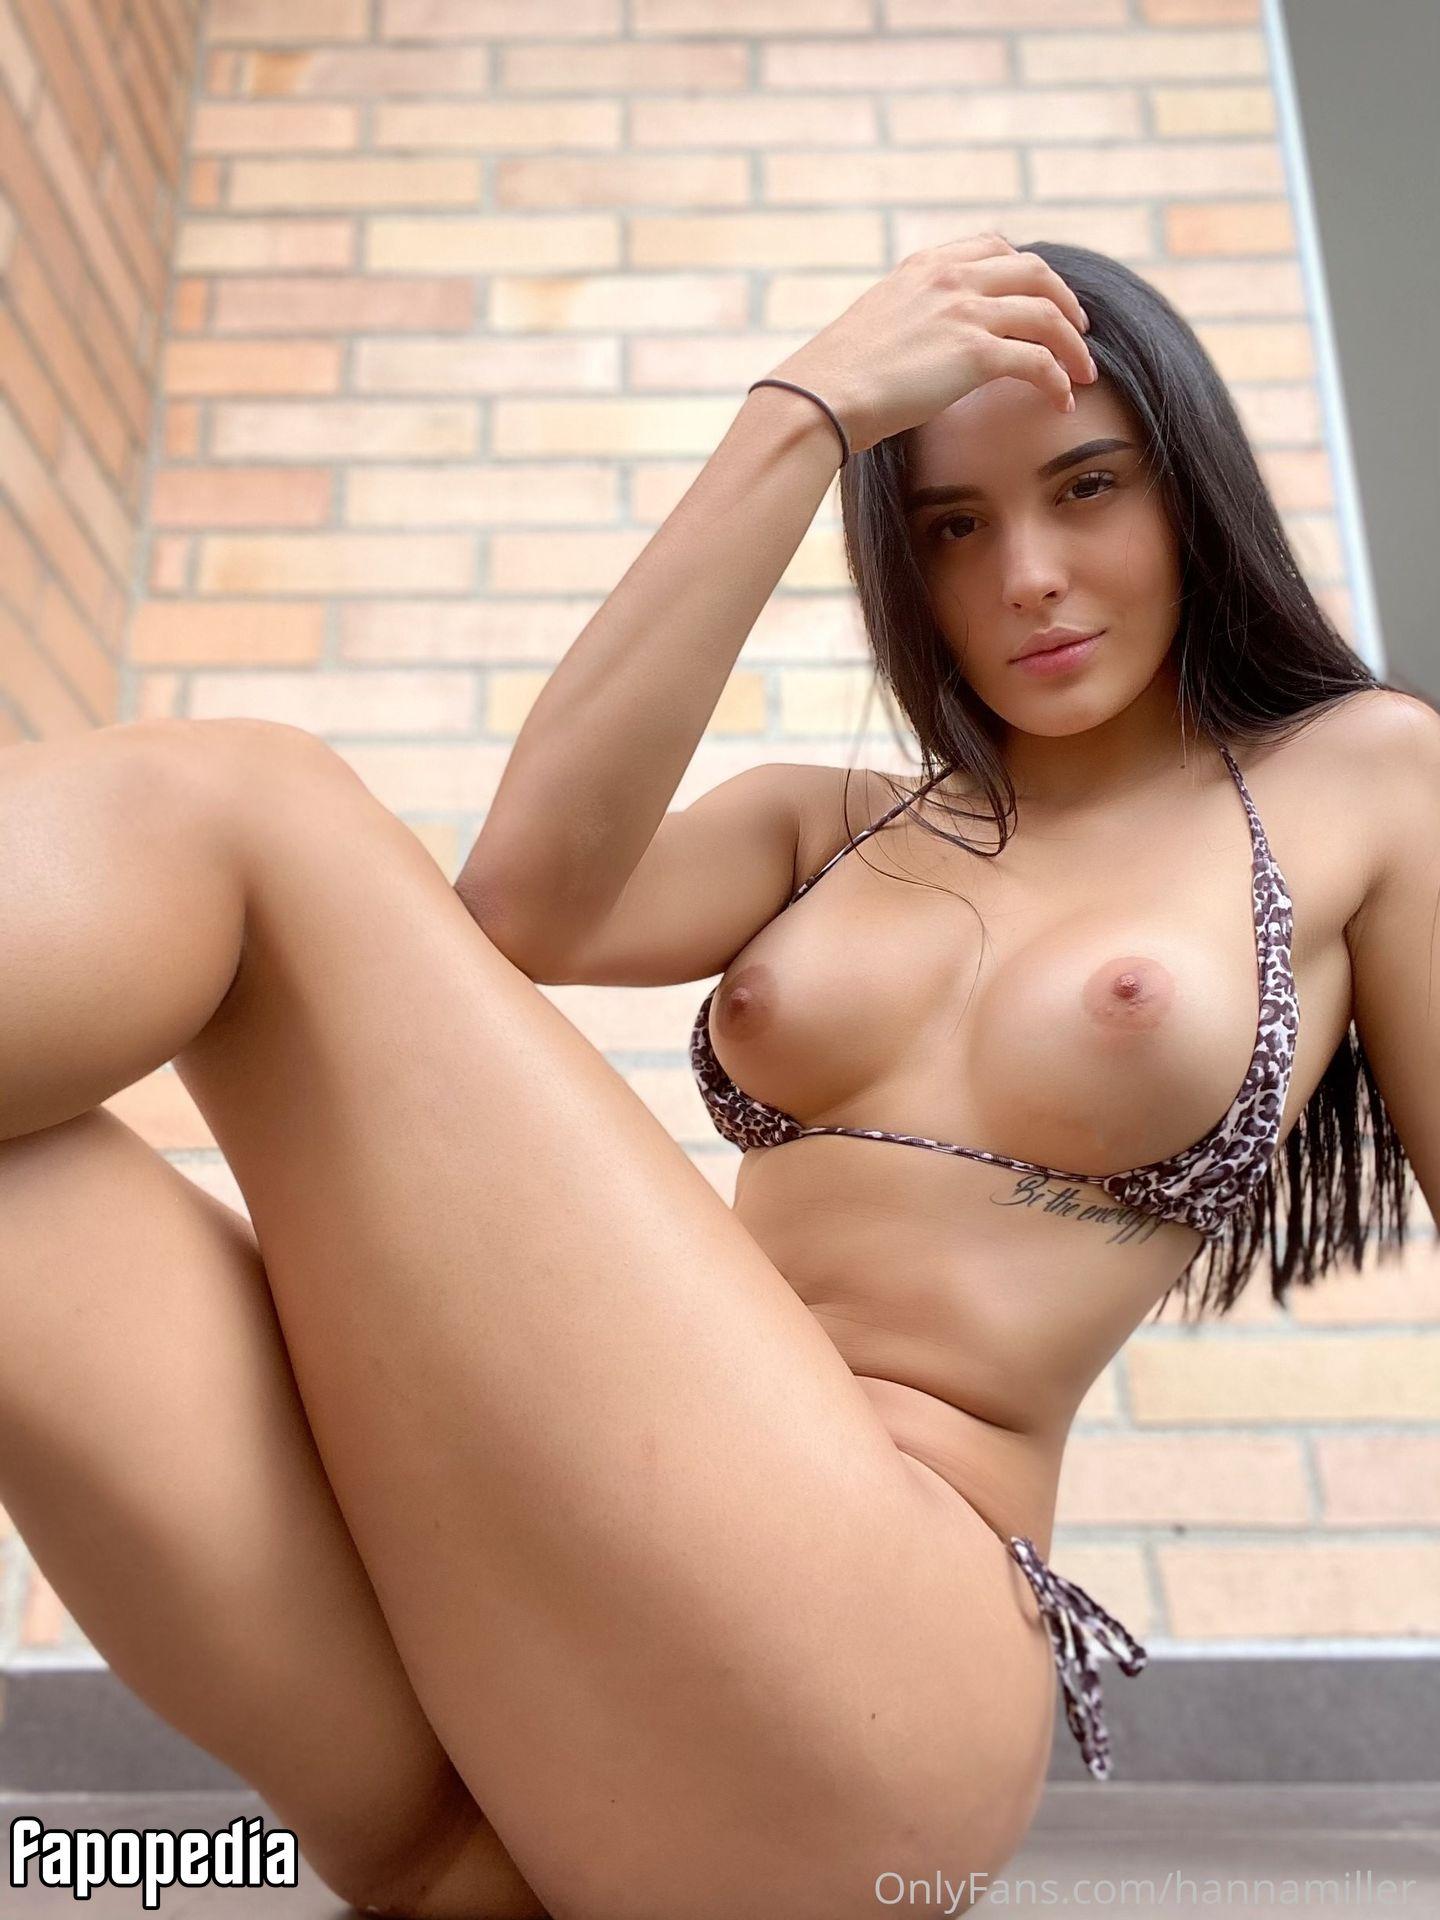 Hannamiller Nude OnlyFans Leaks